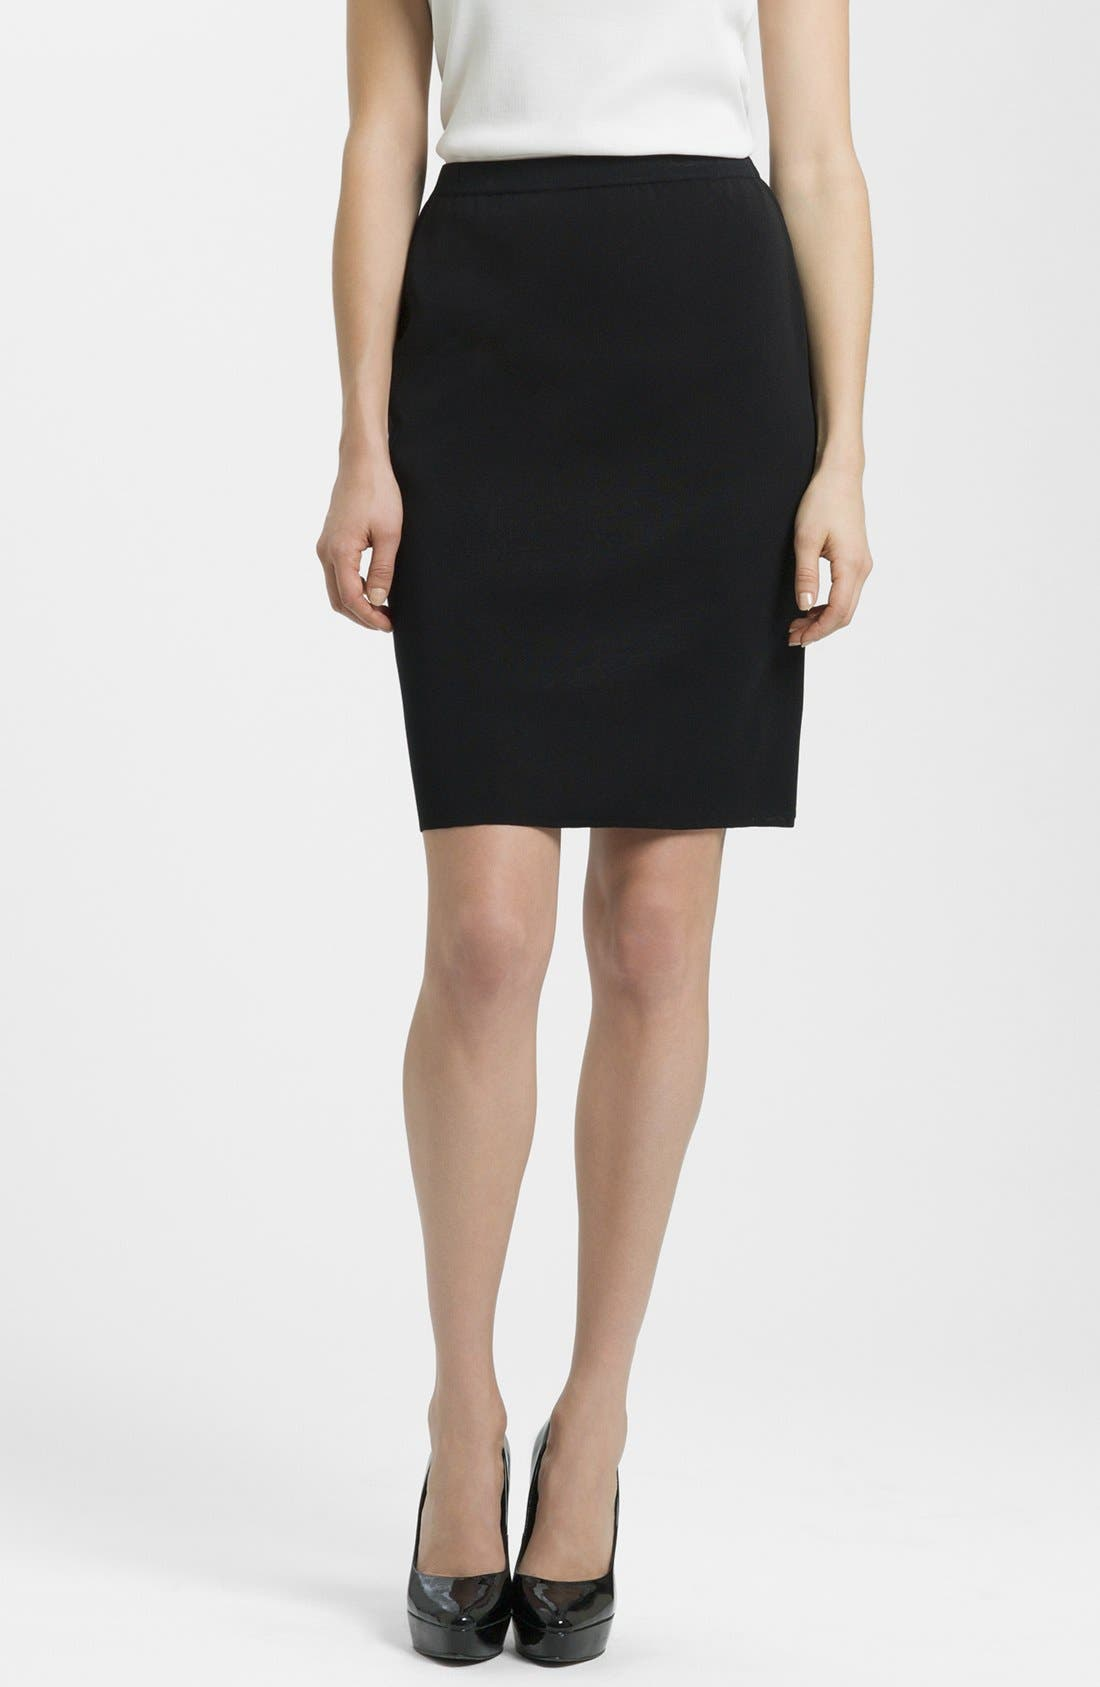 Alternate Image 1 Selected - Ming Wang Knit Pencil Skirt